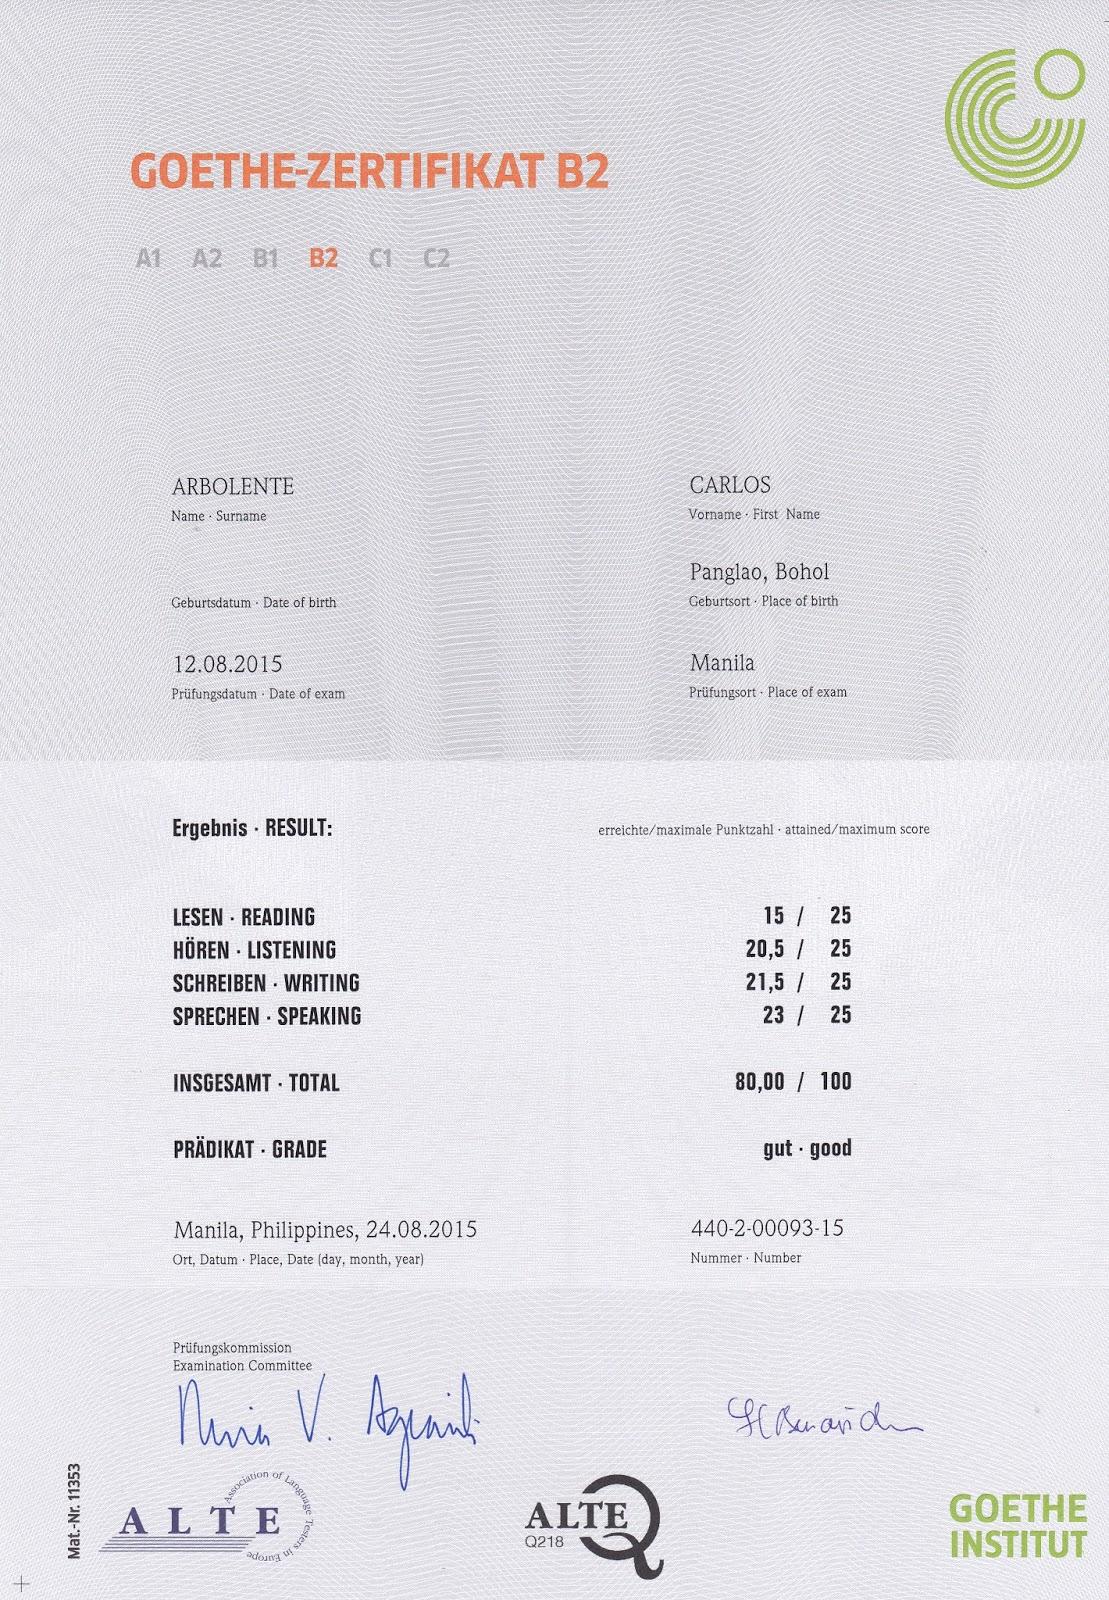 Prüfungstraining Goethe Zertifikat B2 Pdf Xps